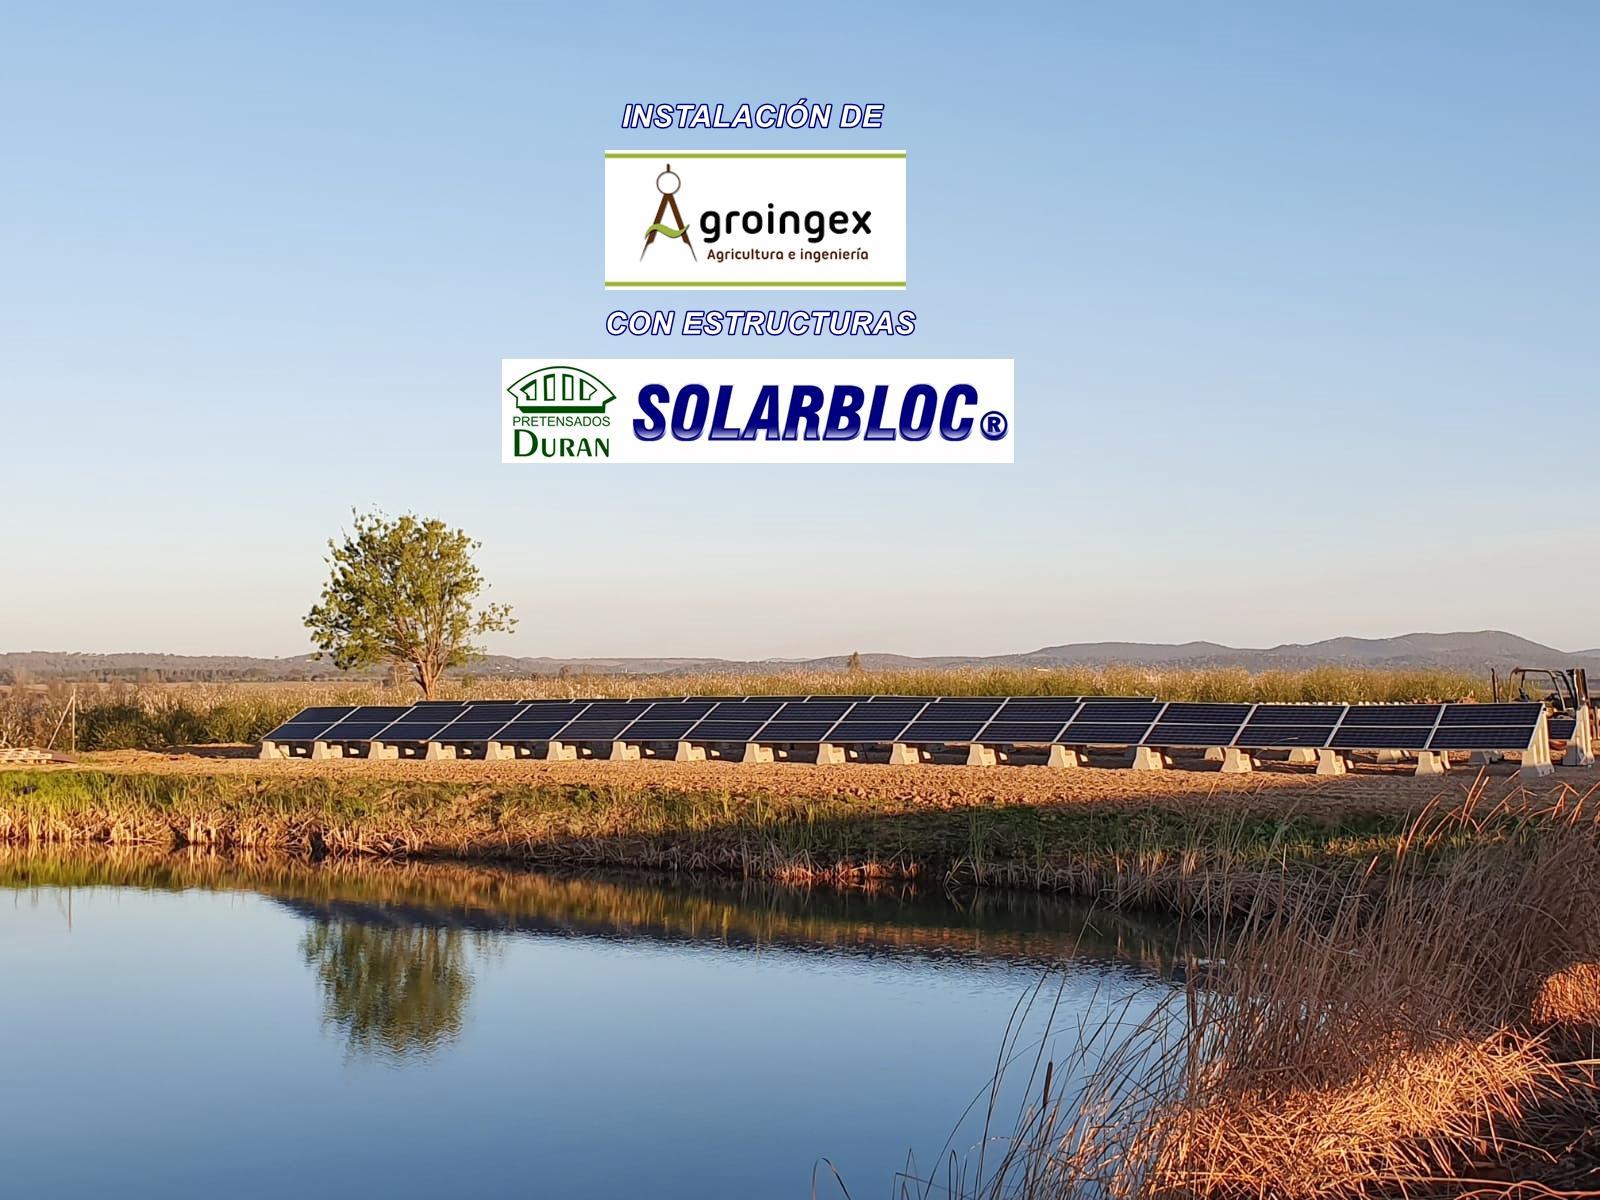 Soportes para placas solares fotovoltaicas SOLARBLOC Agroingex